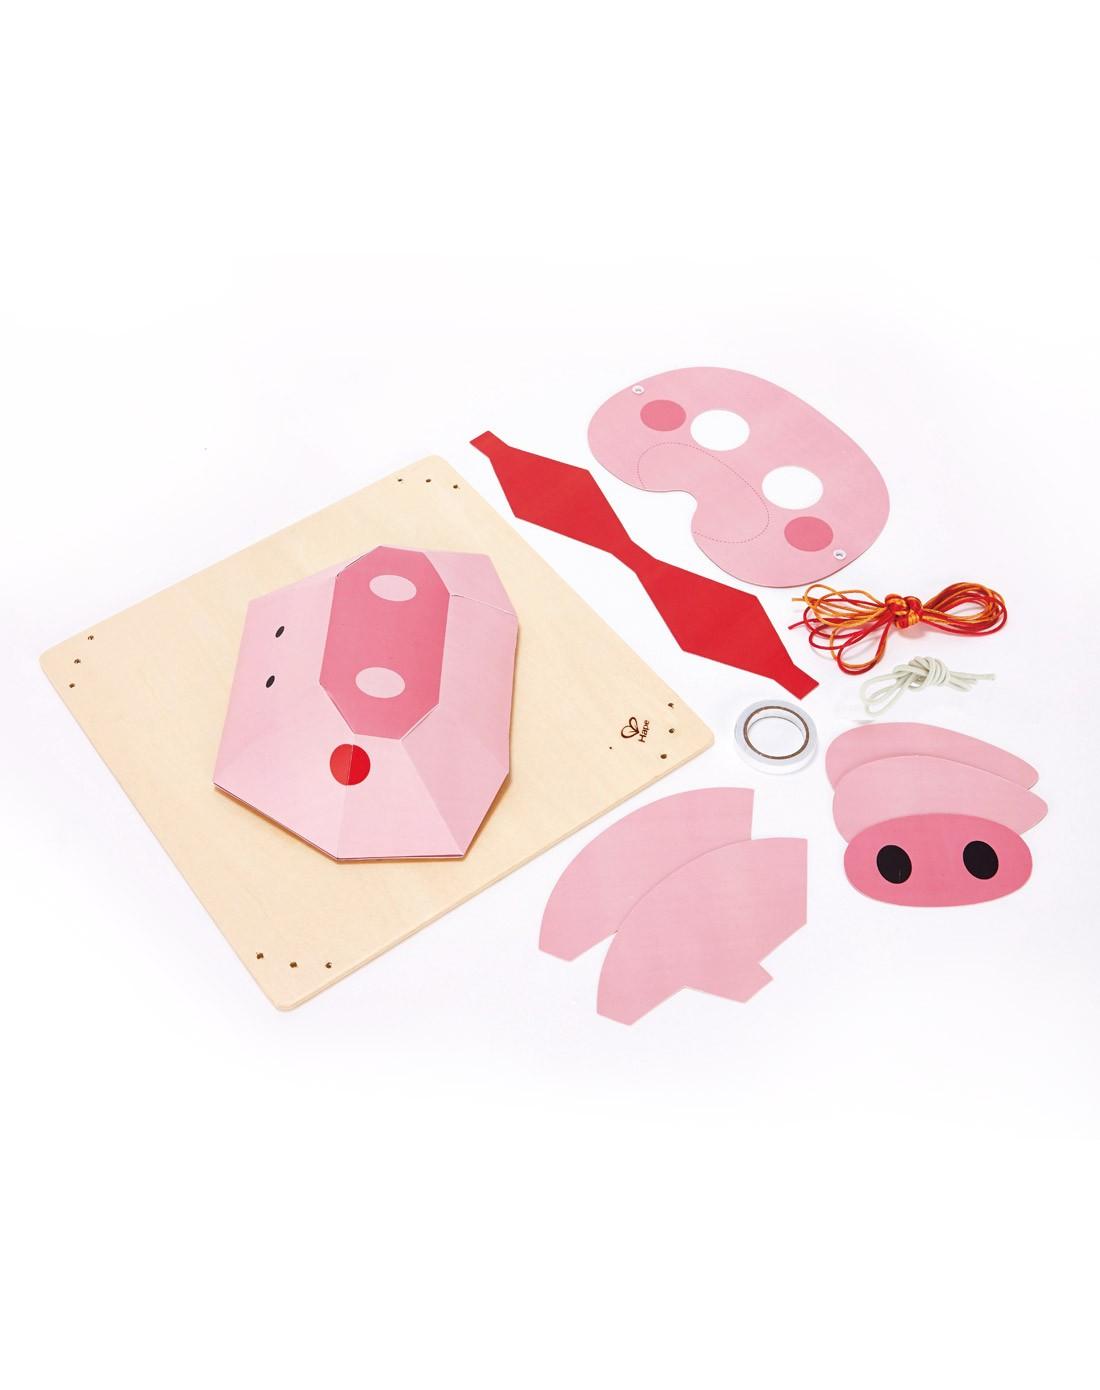 德国hapediy立体折纸画-小猪e5126